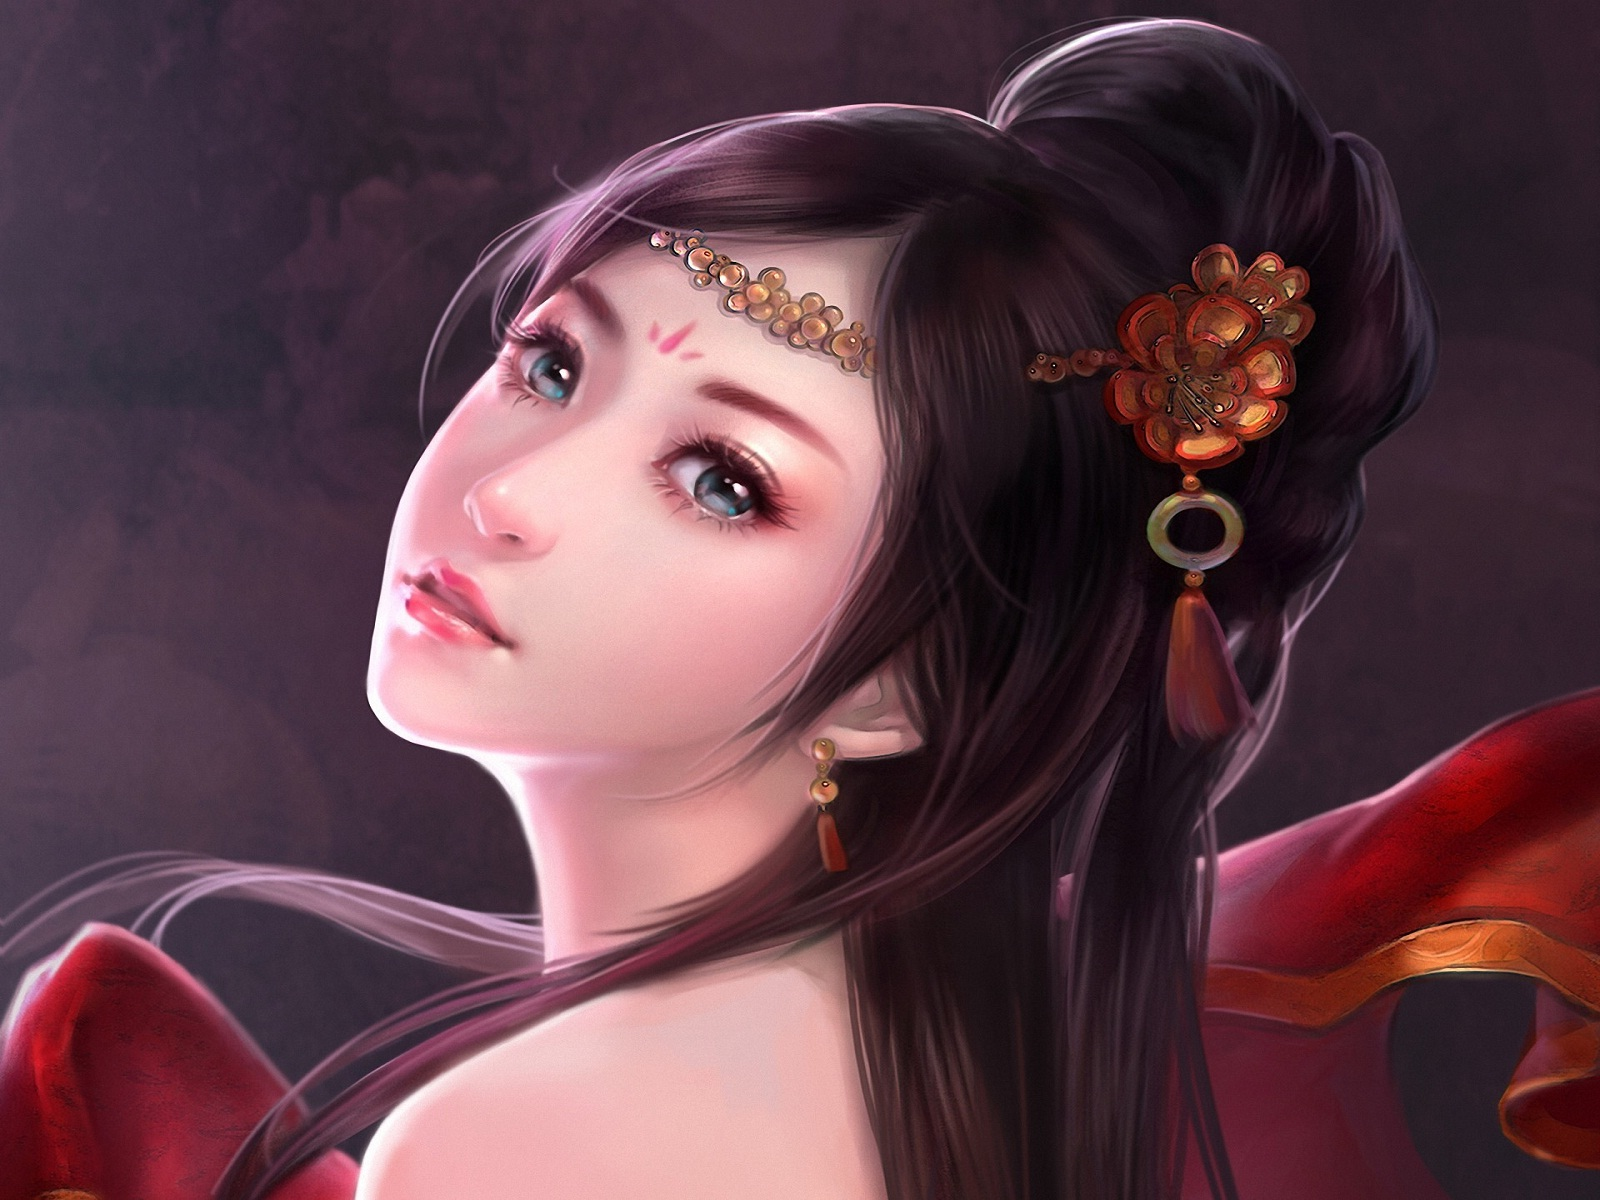 Samurai Girl Wallpaper Hd Fantasy Girl Wallpapers Hd Pixelstalk Net